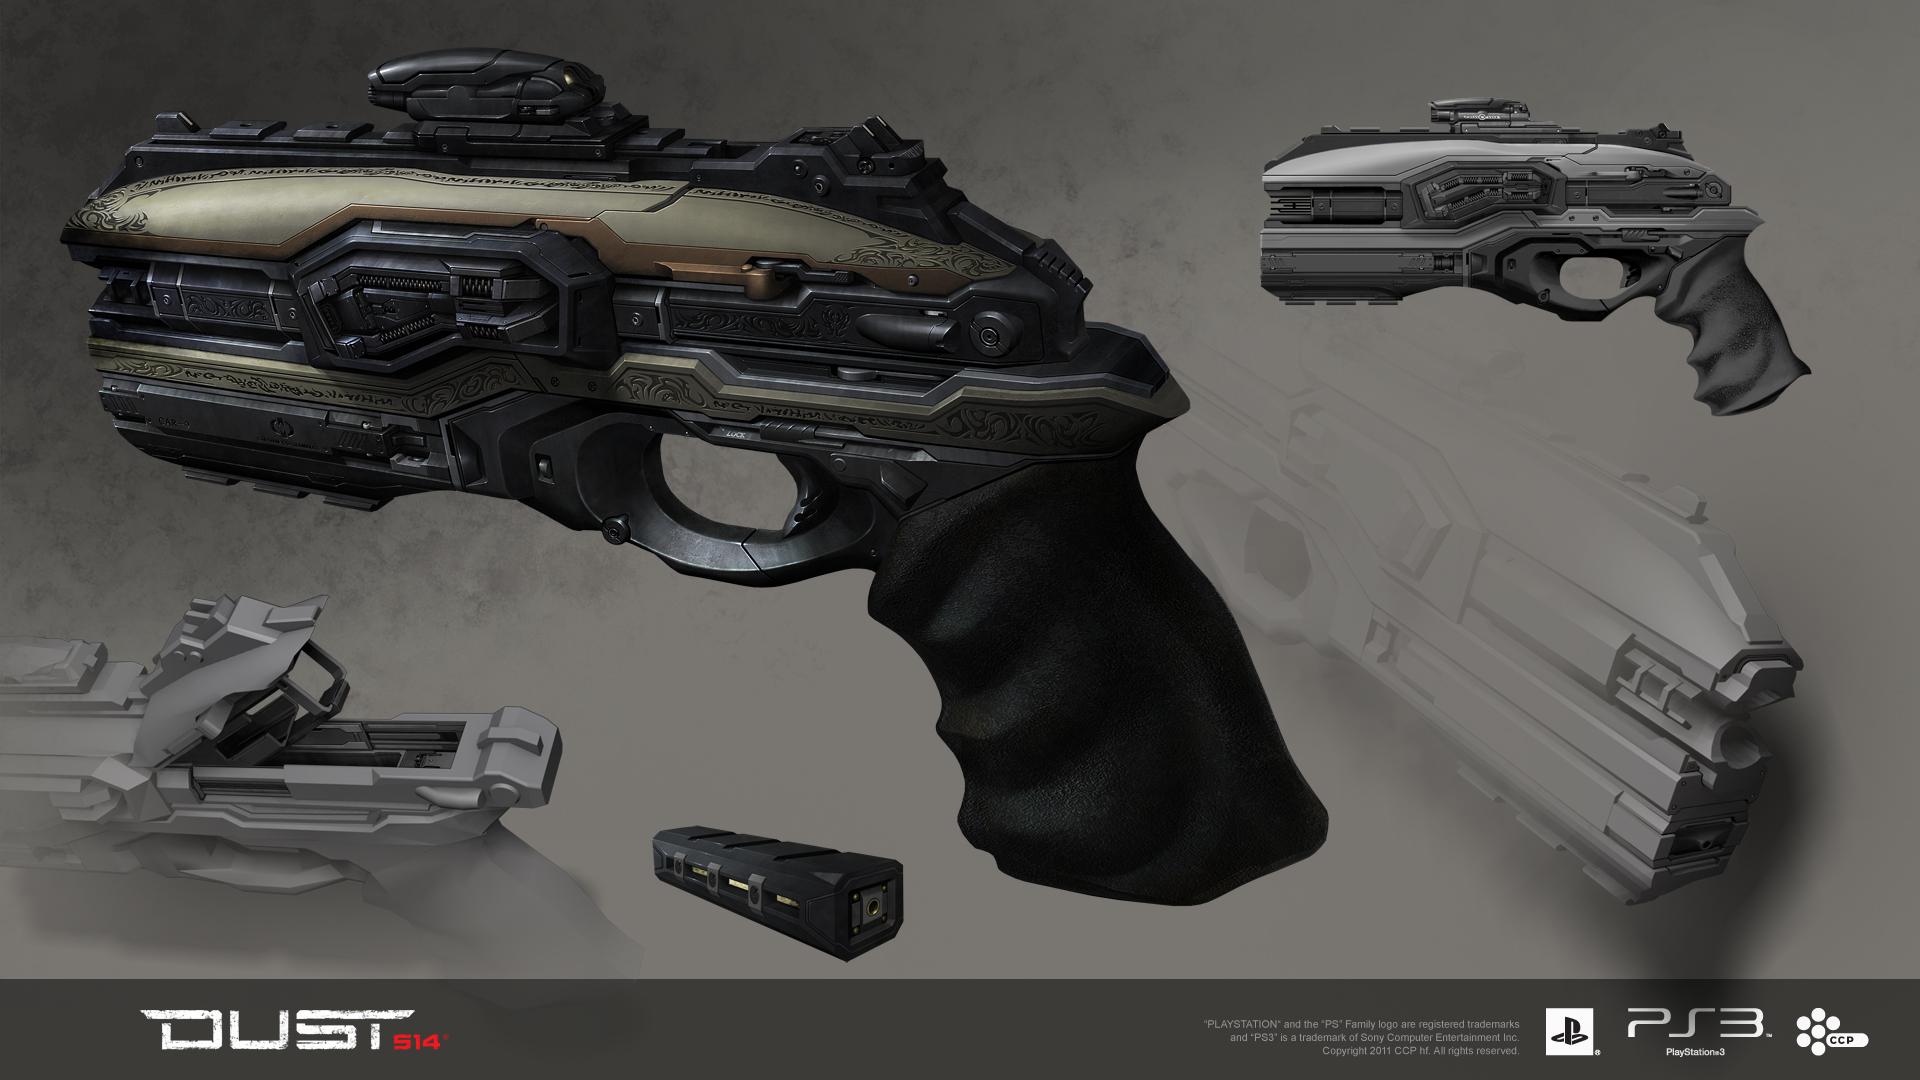 Weapons of Dust AM_ScramblerPistol_Blog